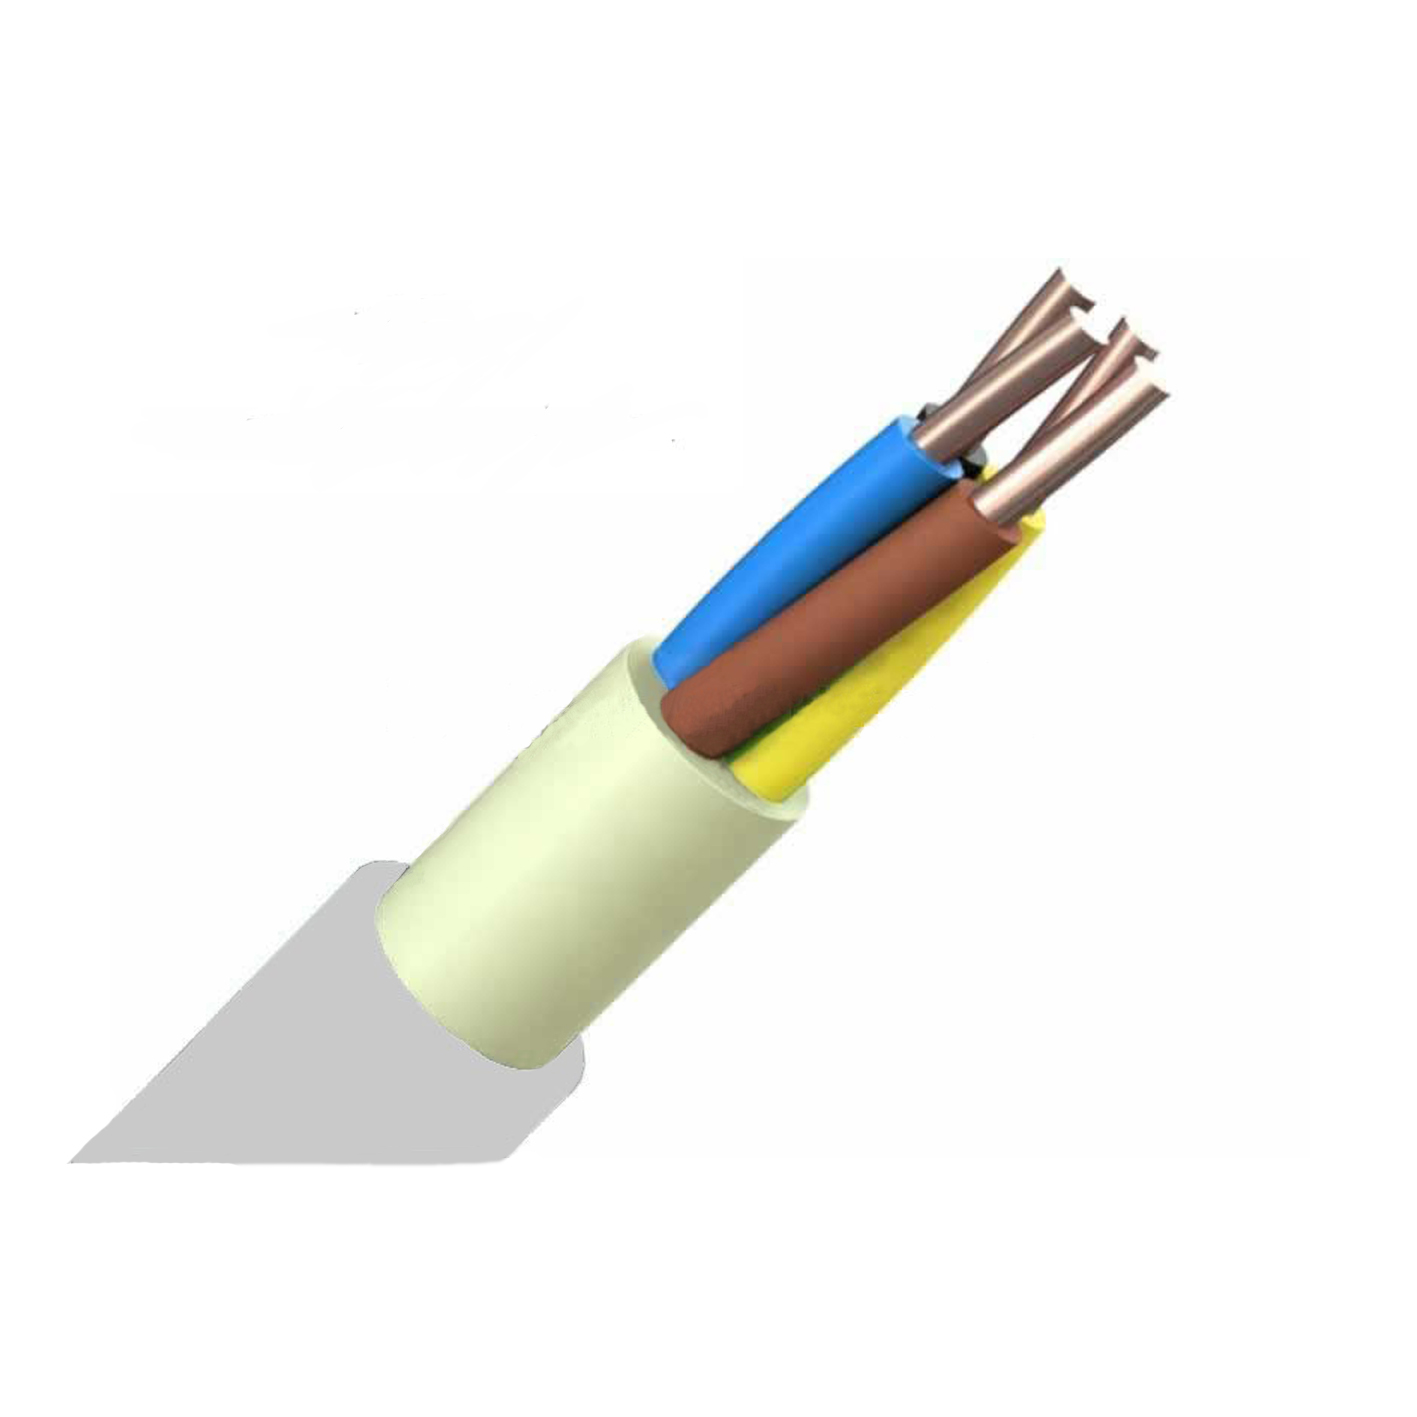 Öznur 2x6 NYM (NVV) Kablo